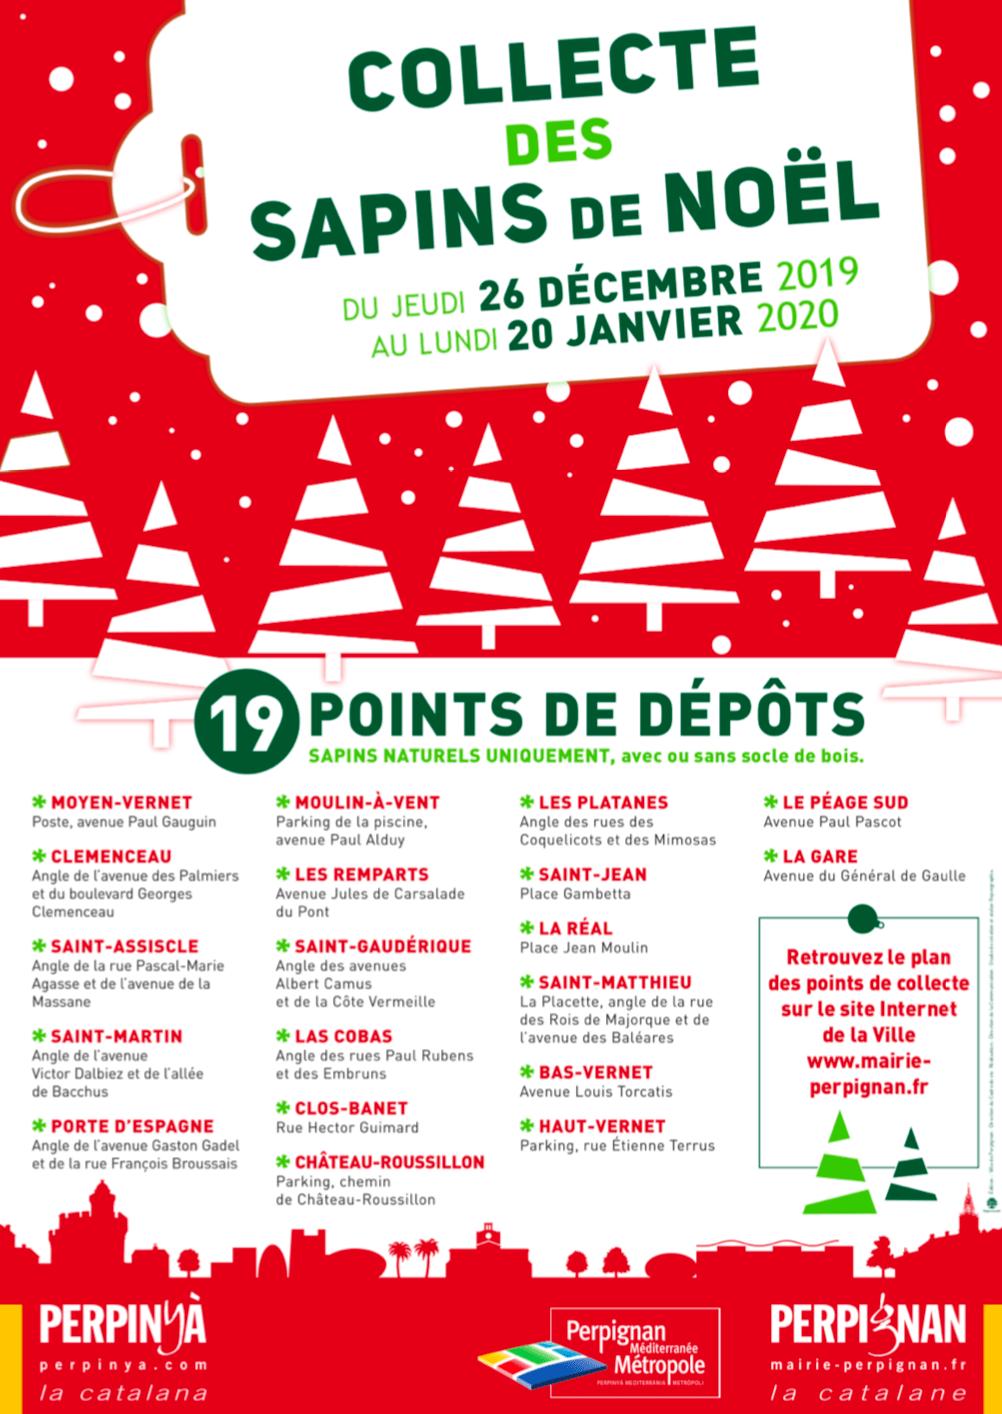 Collecte des sapins de Noël à Perpignan